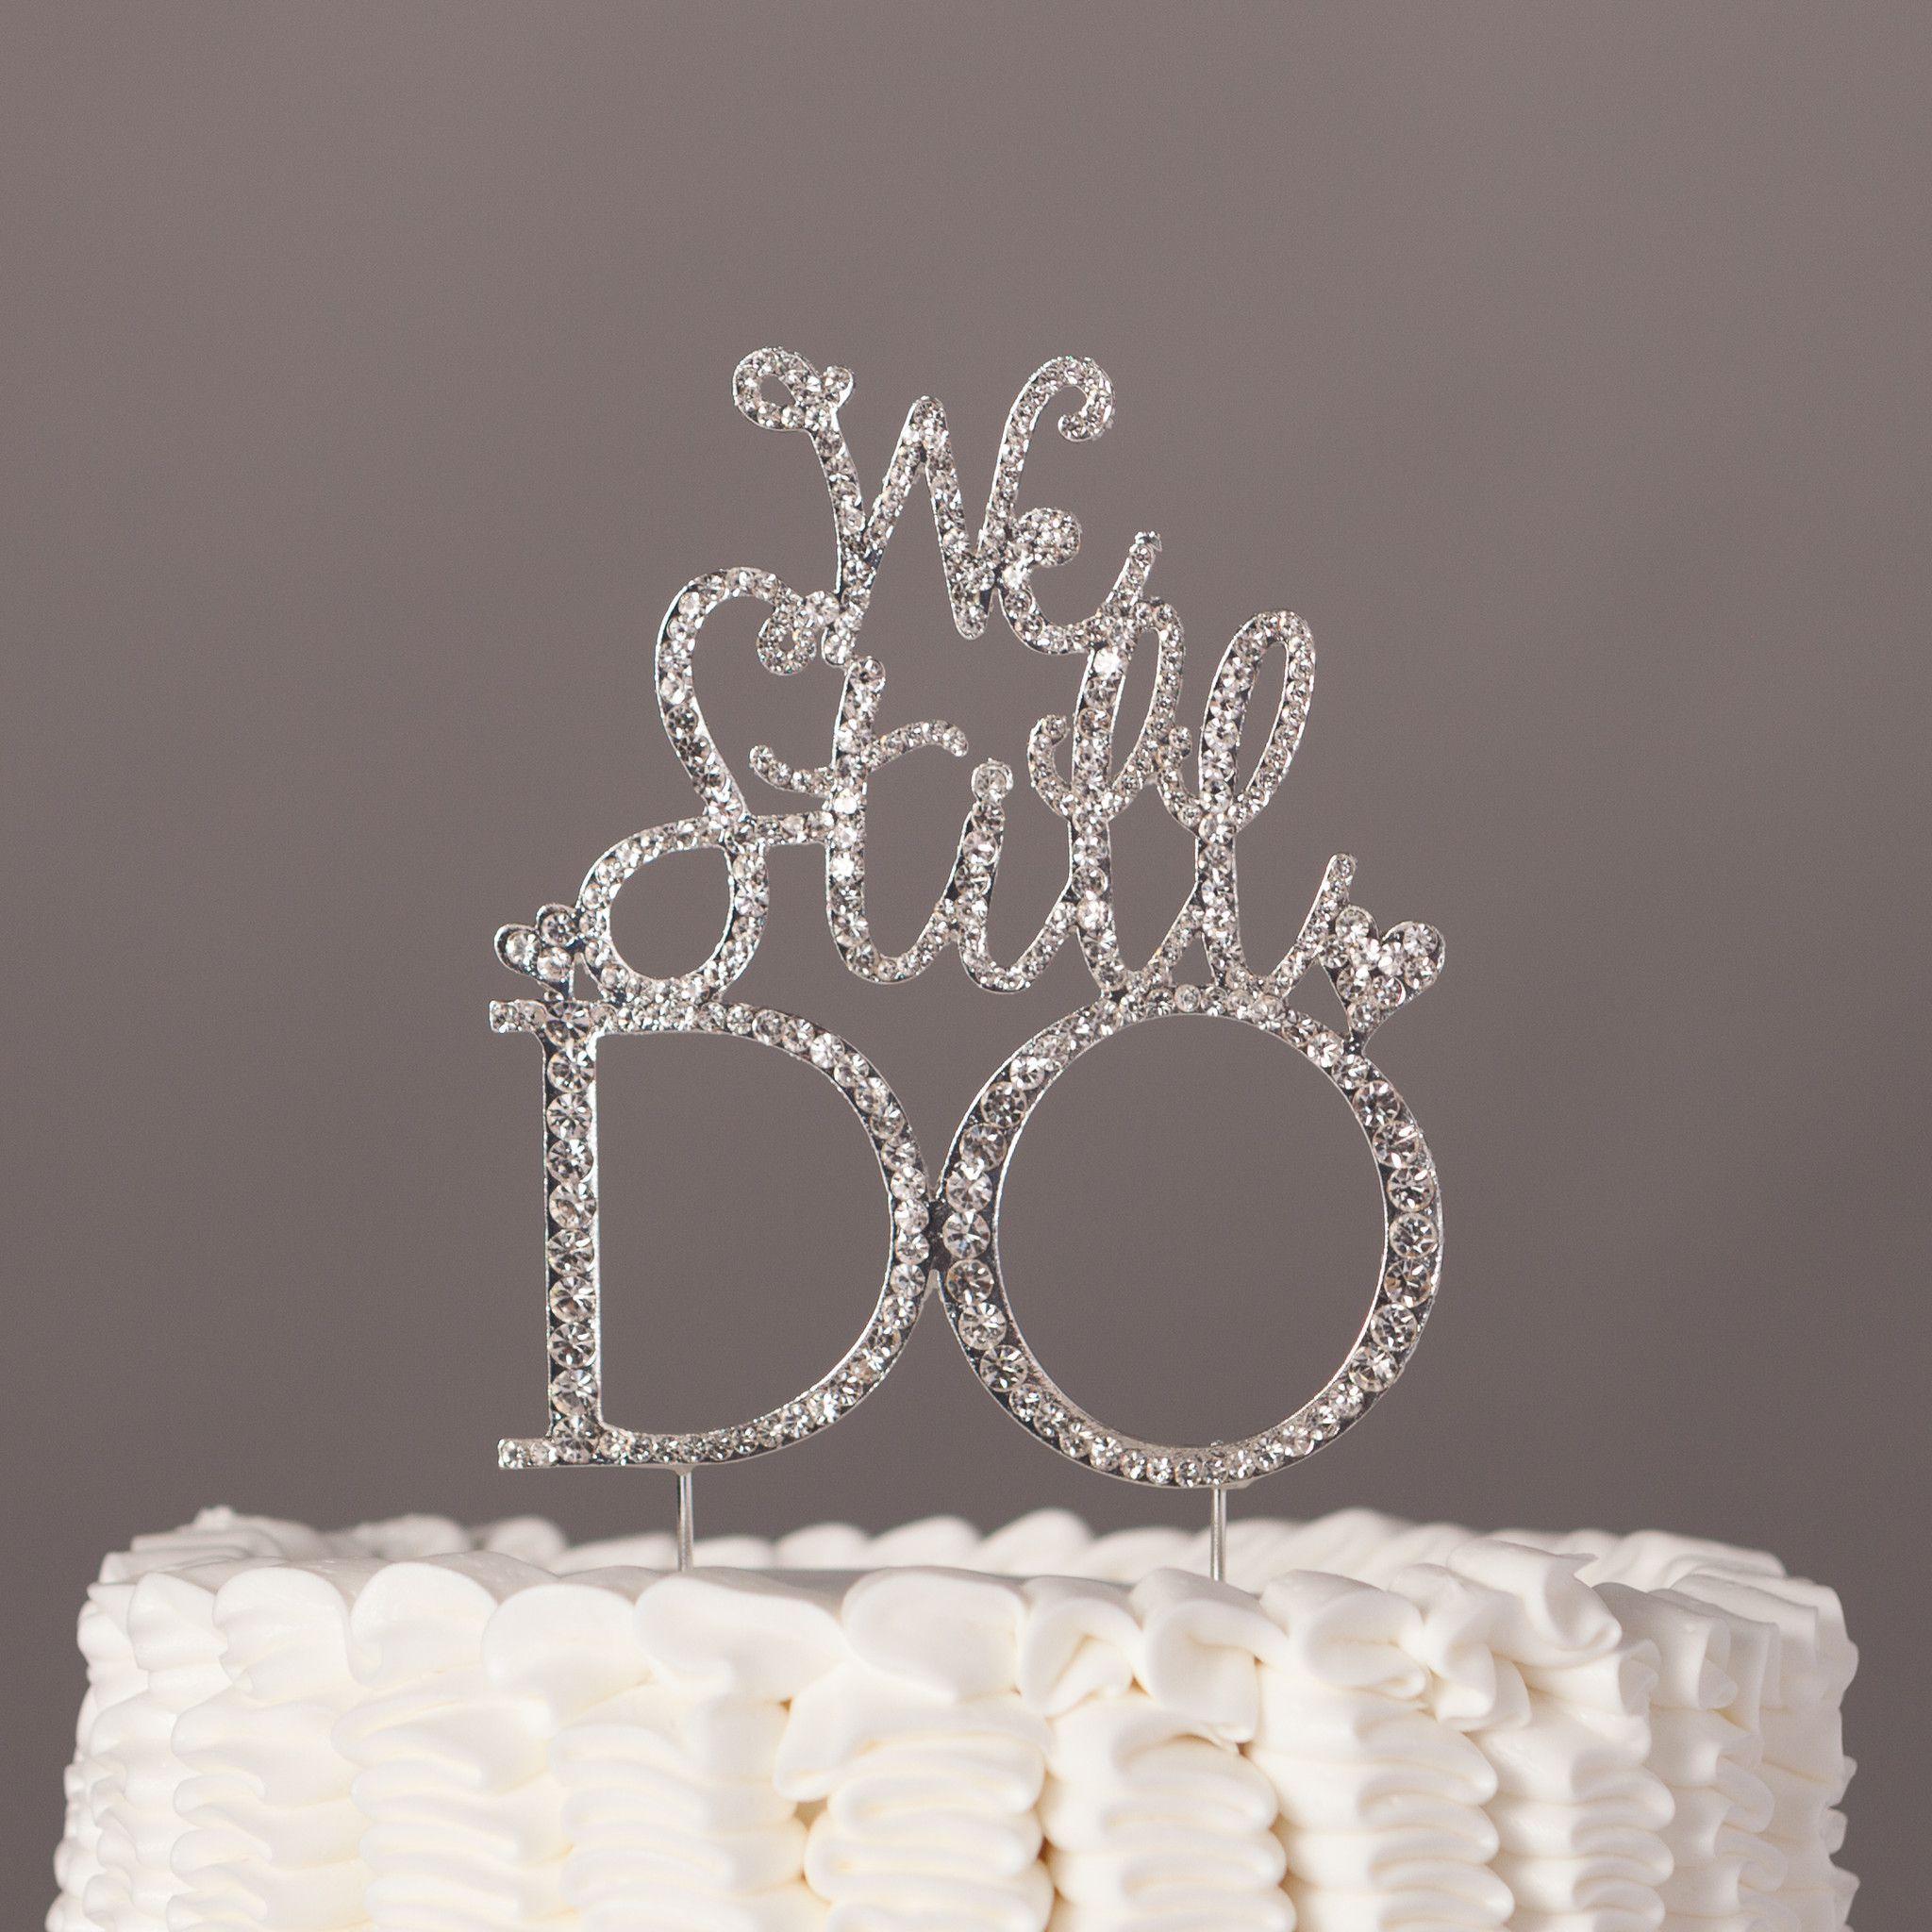 We still do anniversary cake topper silver wedding cakes